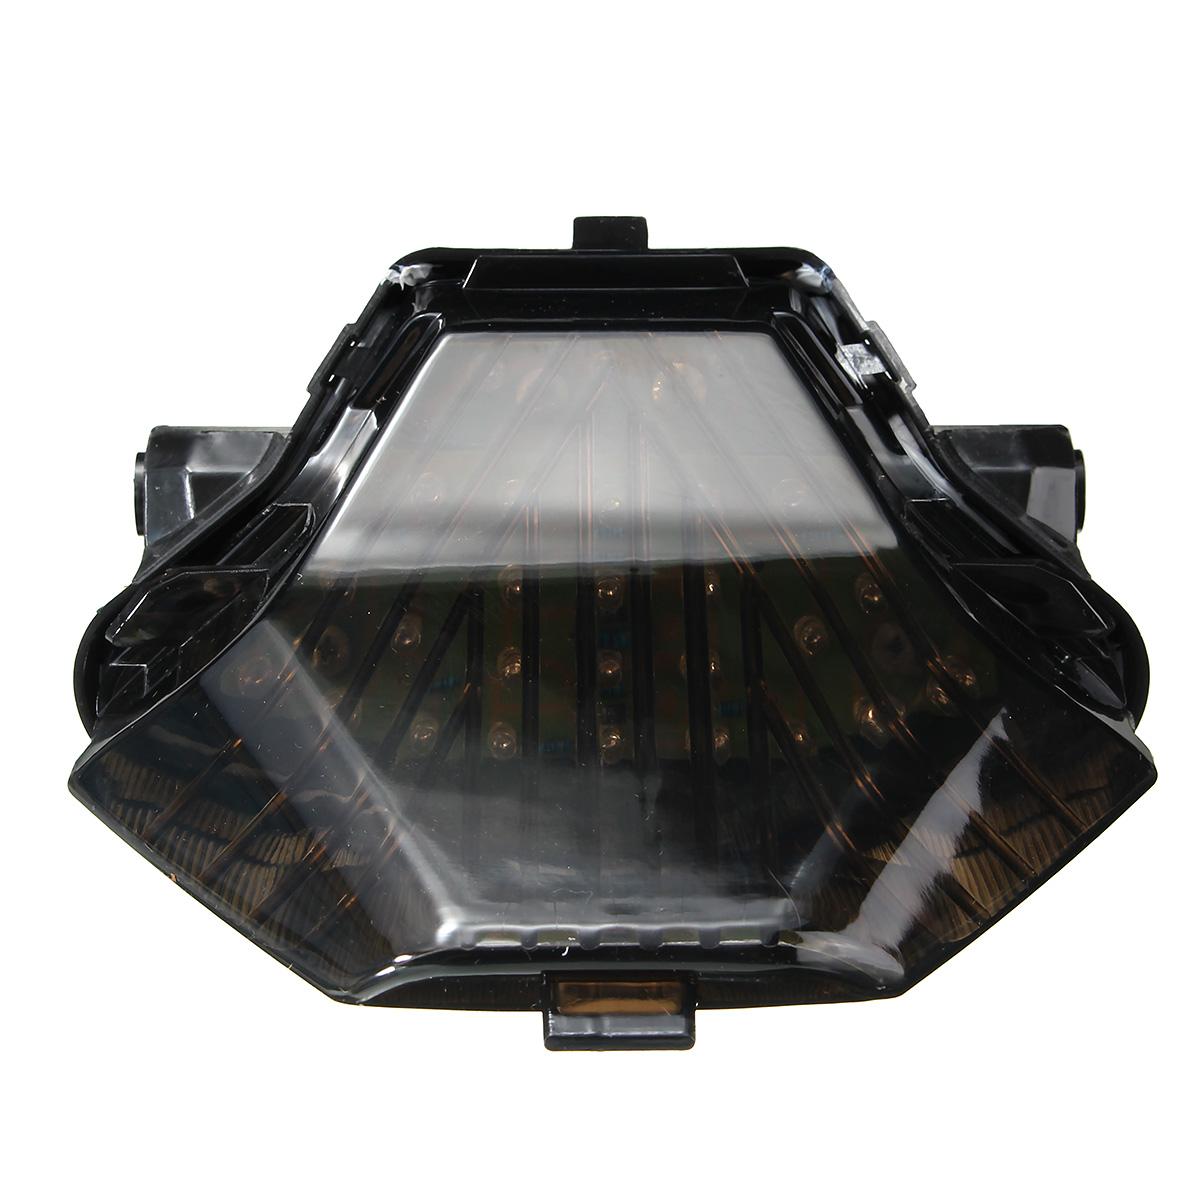 Tail Light Led Integrated Turn Signals Blinker For Yamaha MT07 FZ